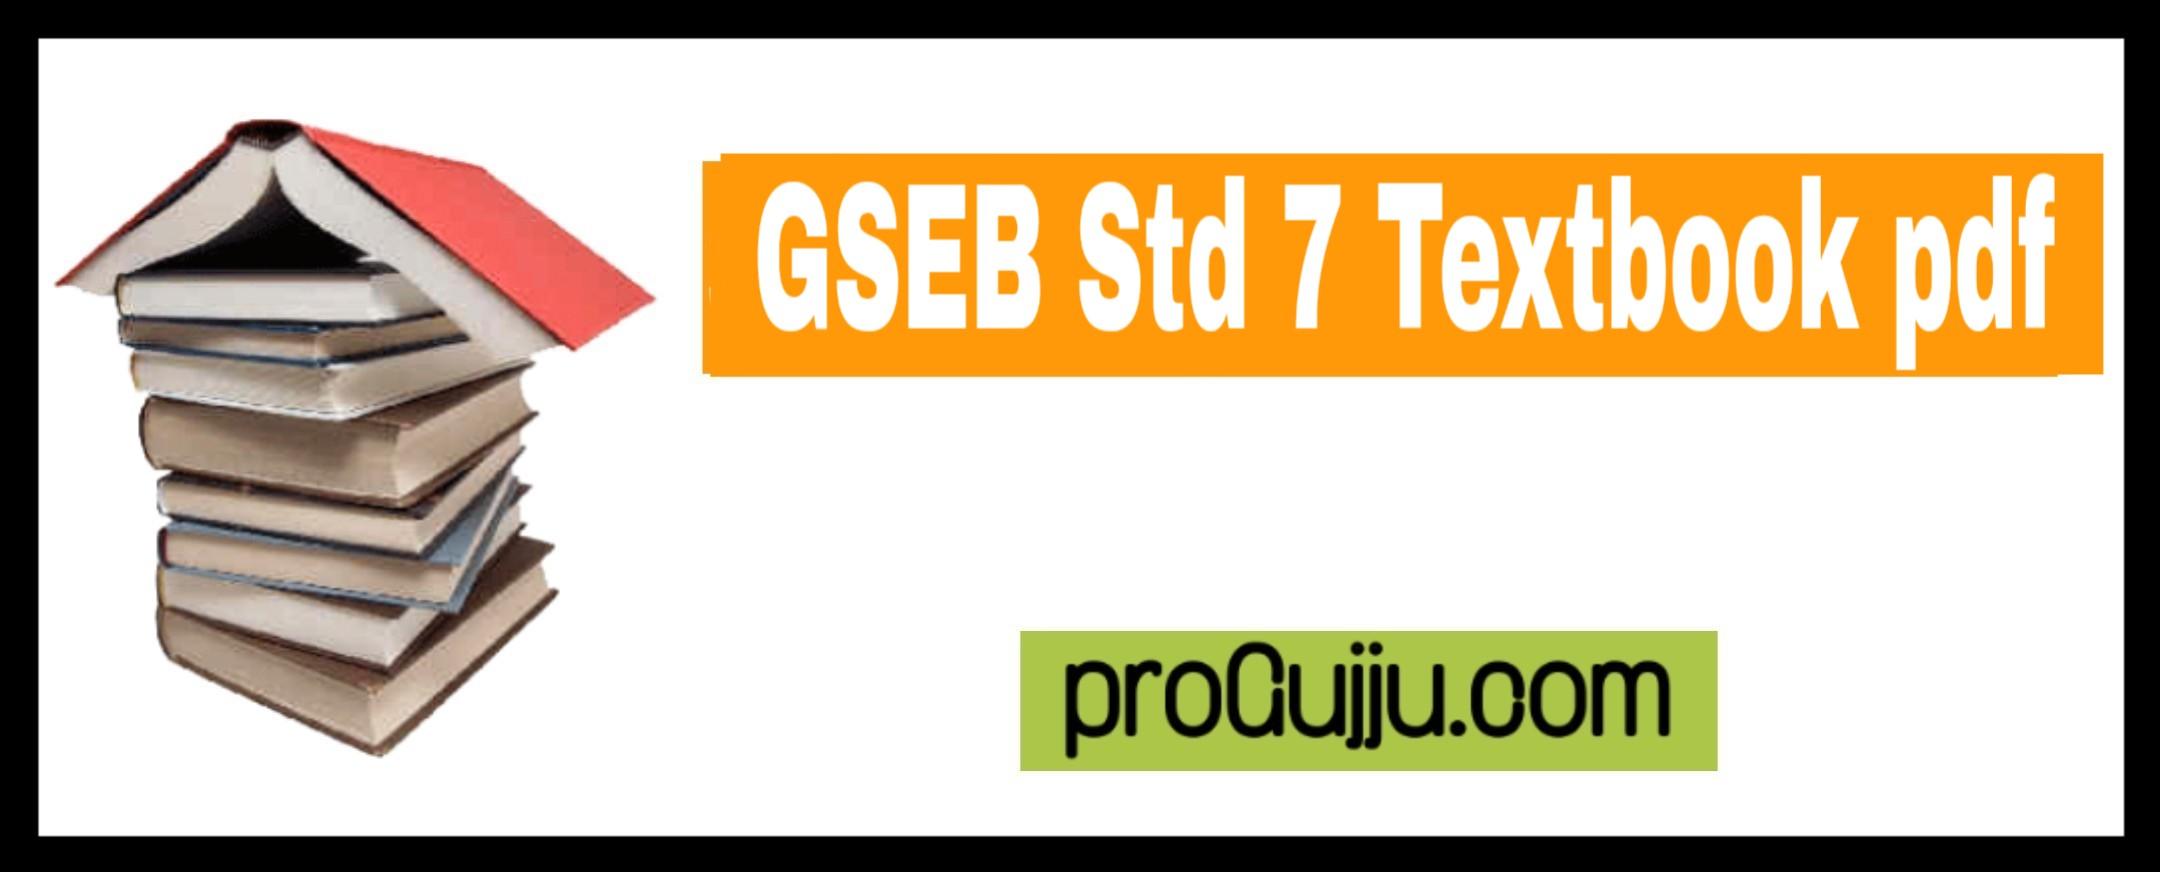 Gseb std 7 textbook